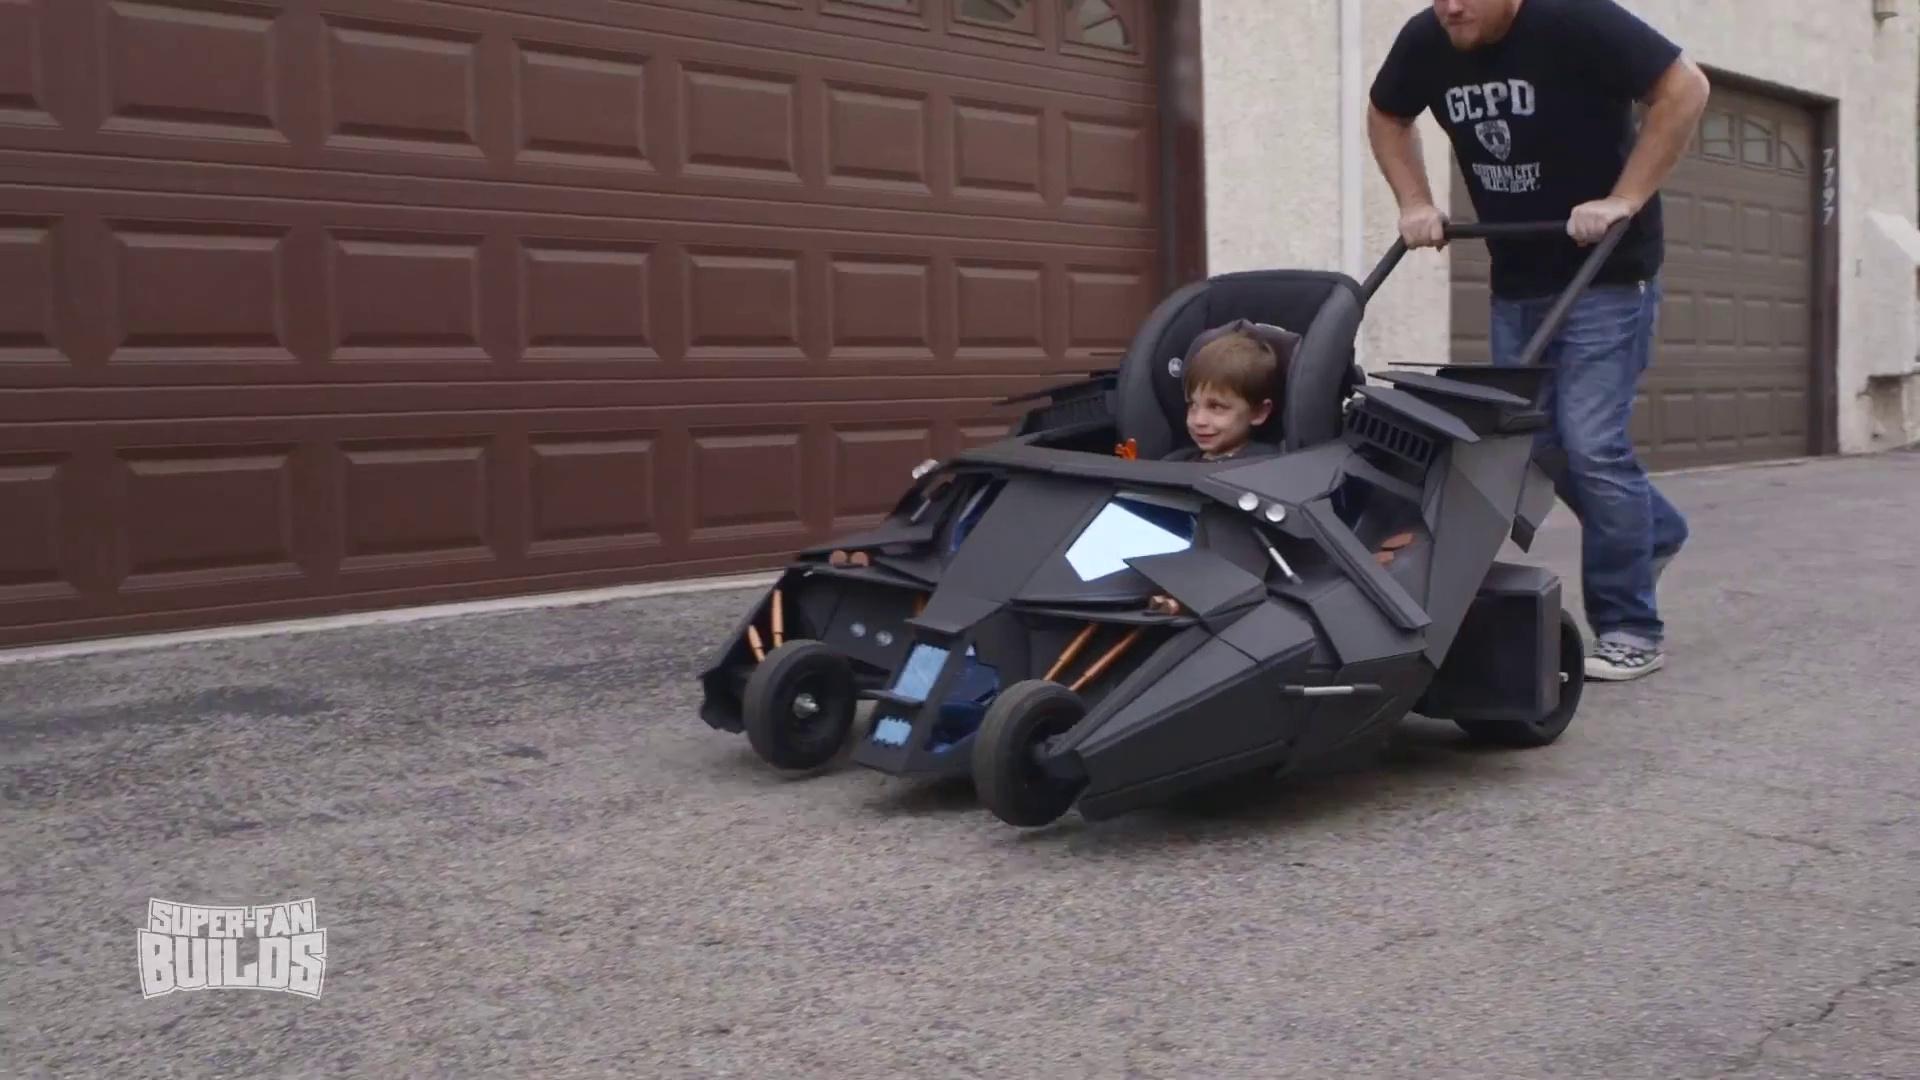 Toddler's Batmobile Stroller from the The Dark Knight